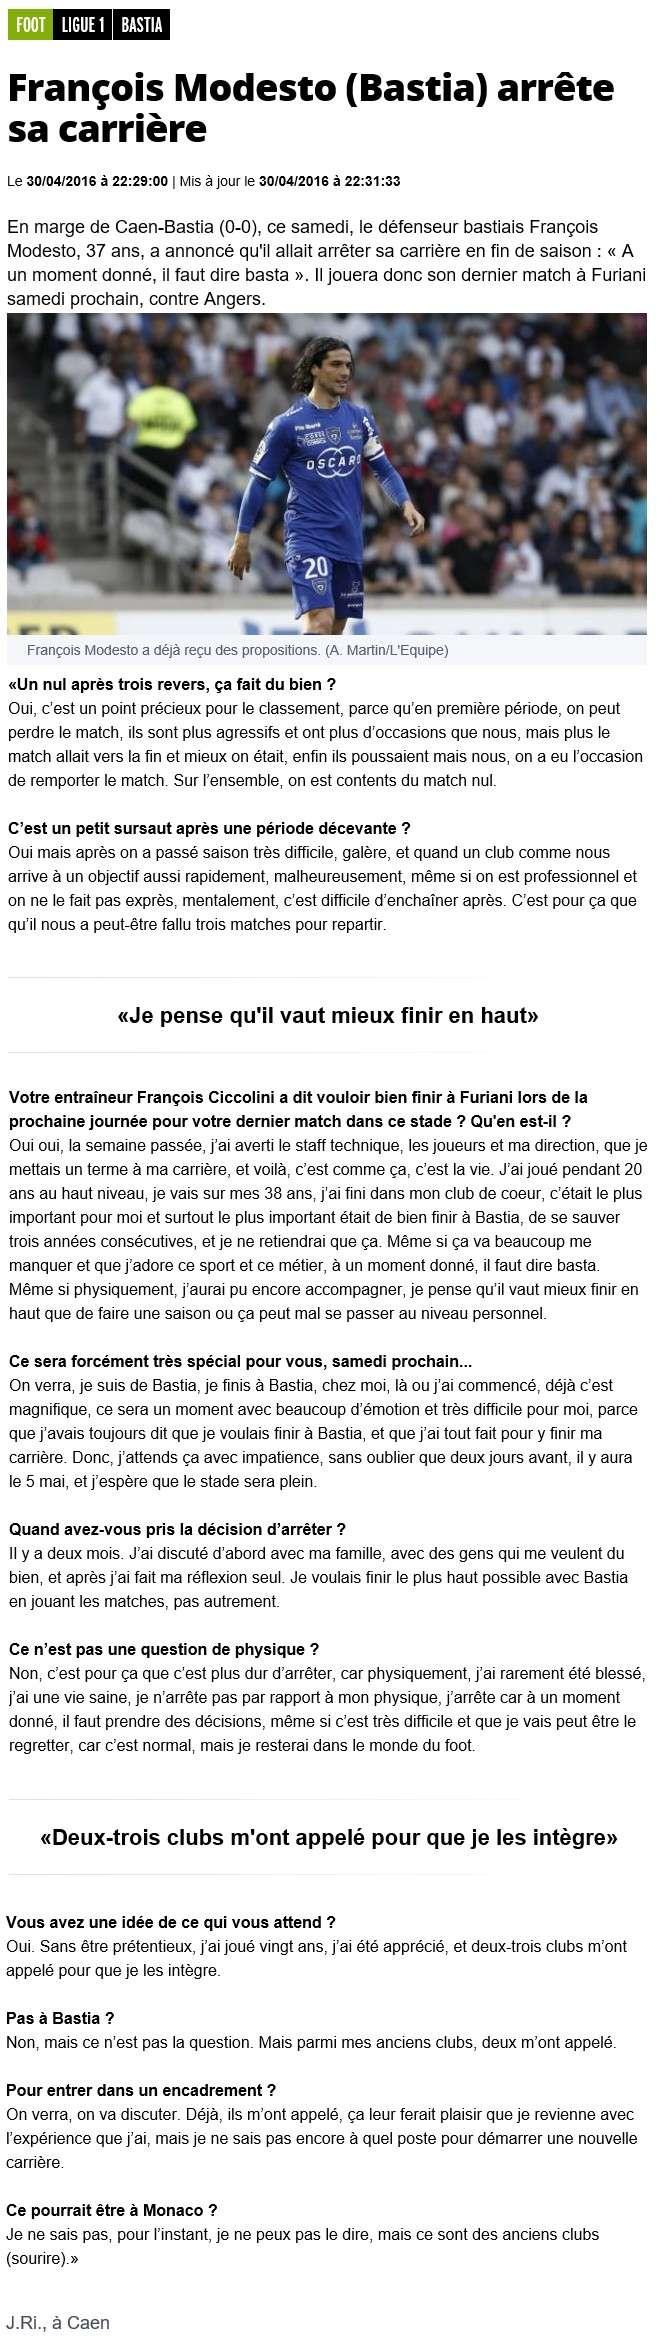 François Modesto annonce sa retraite sportive S45